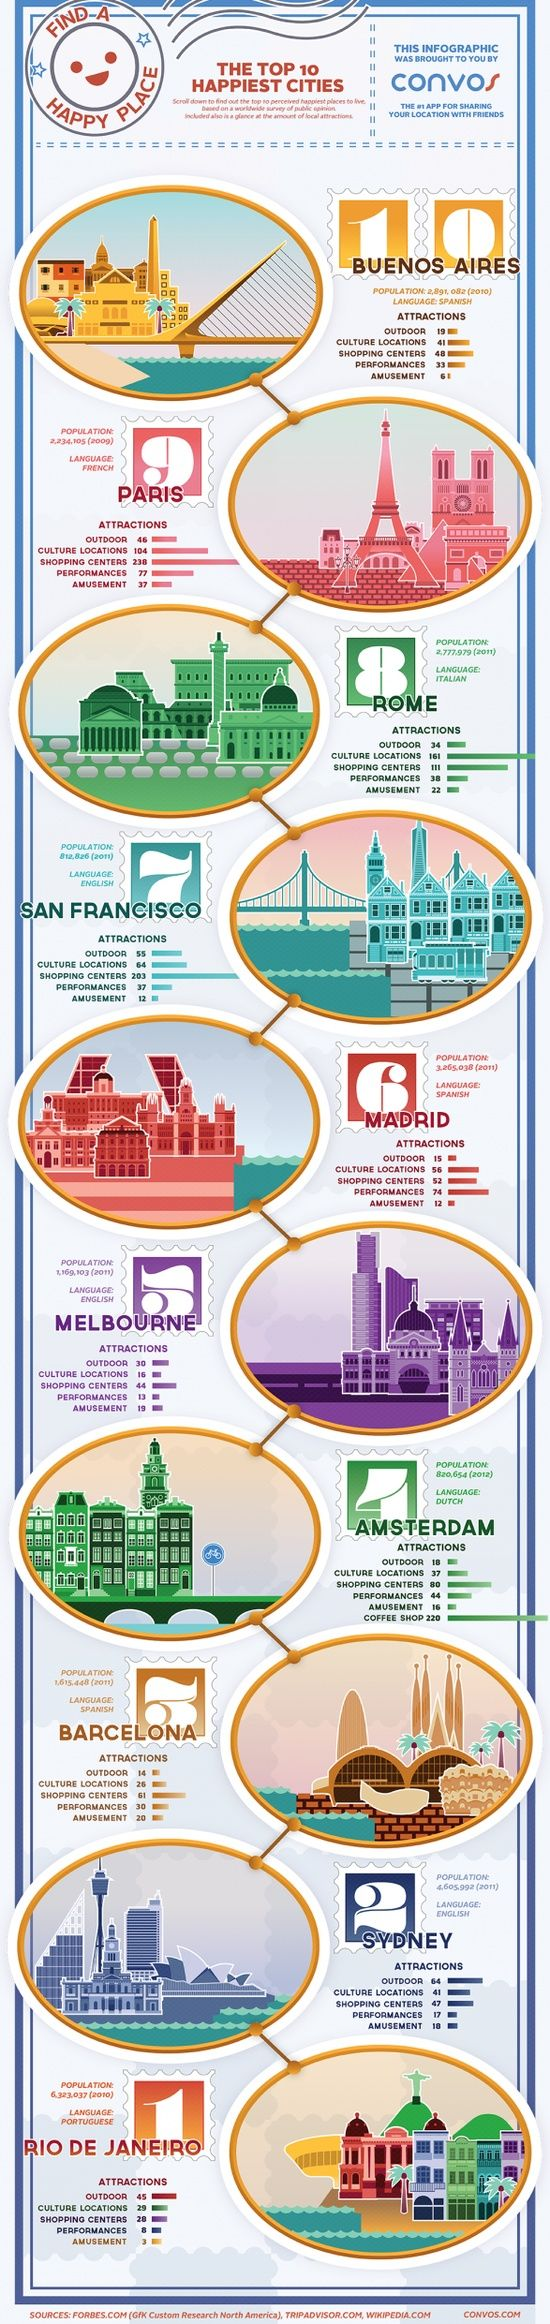 Top 10 Happiest cities - travel infographic